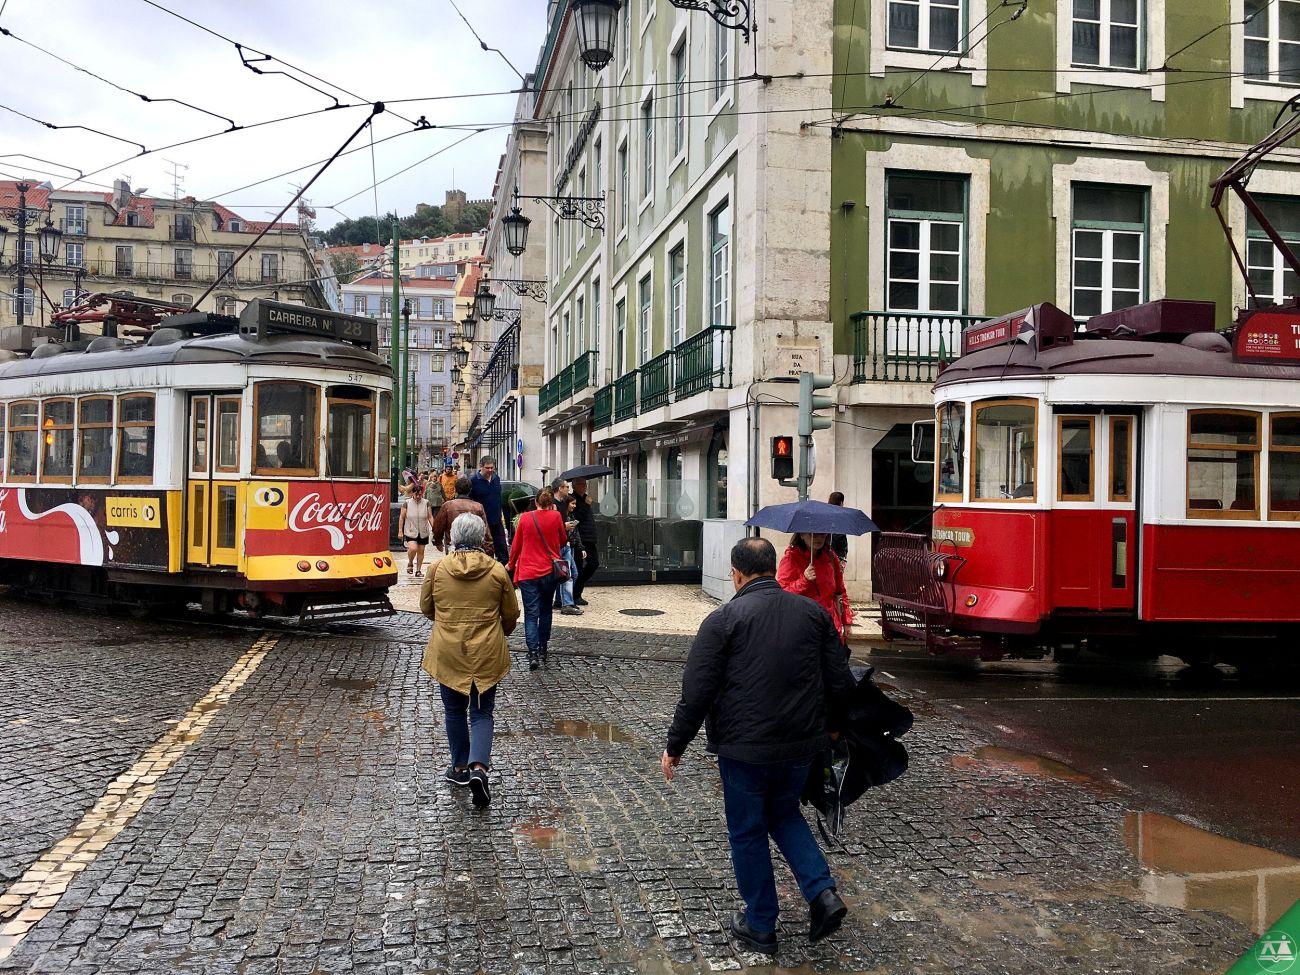 Erasmus-Braga-2019-Lizbona-Fatima-012